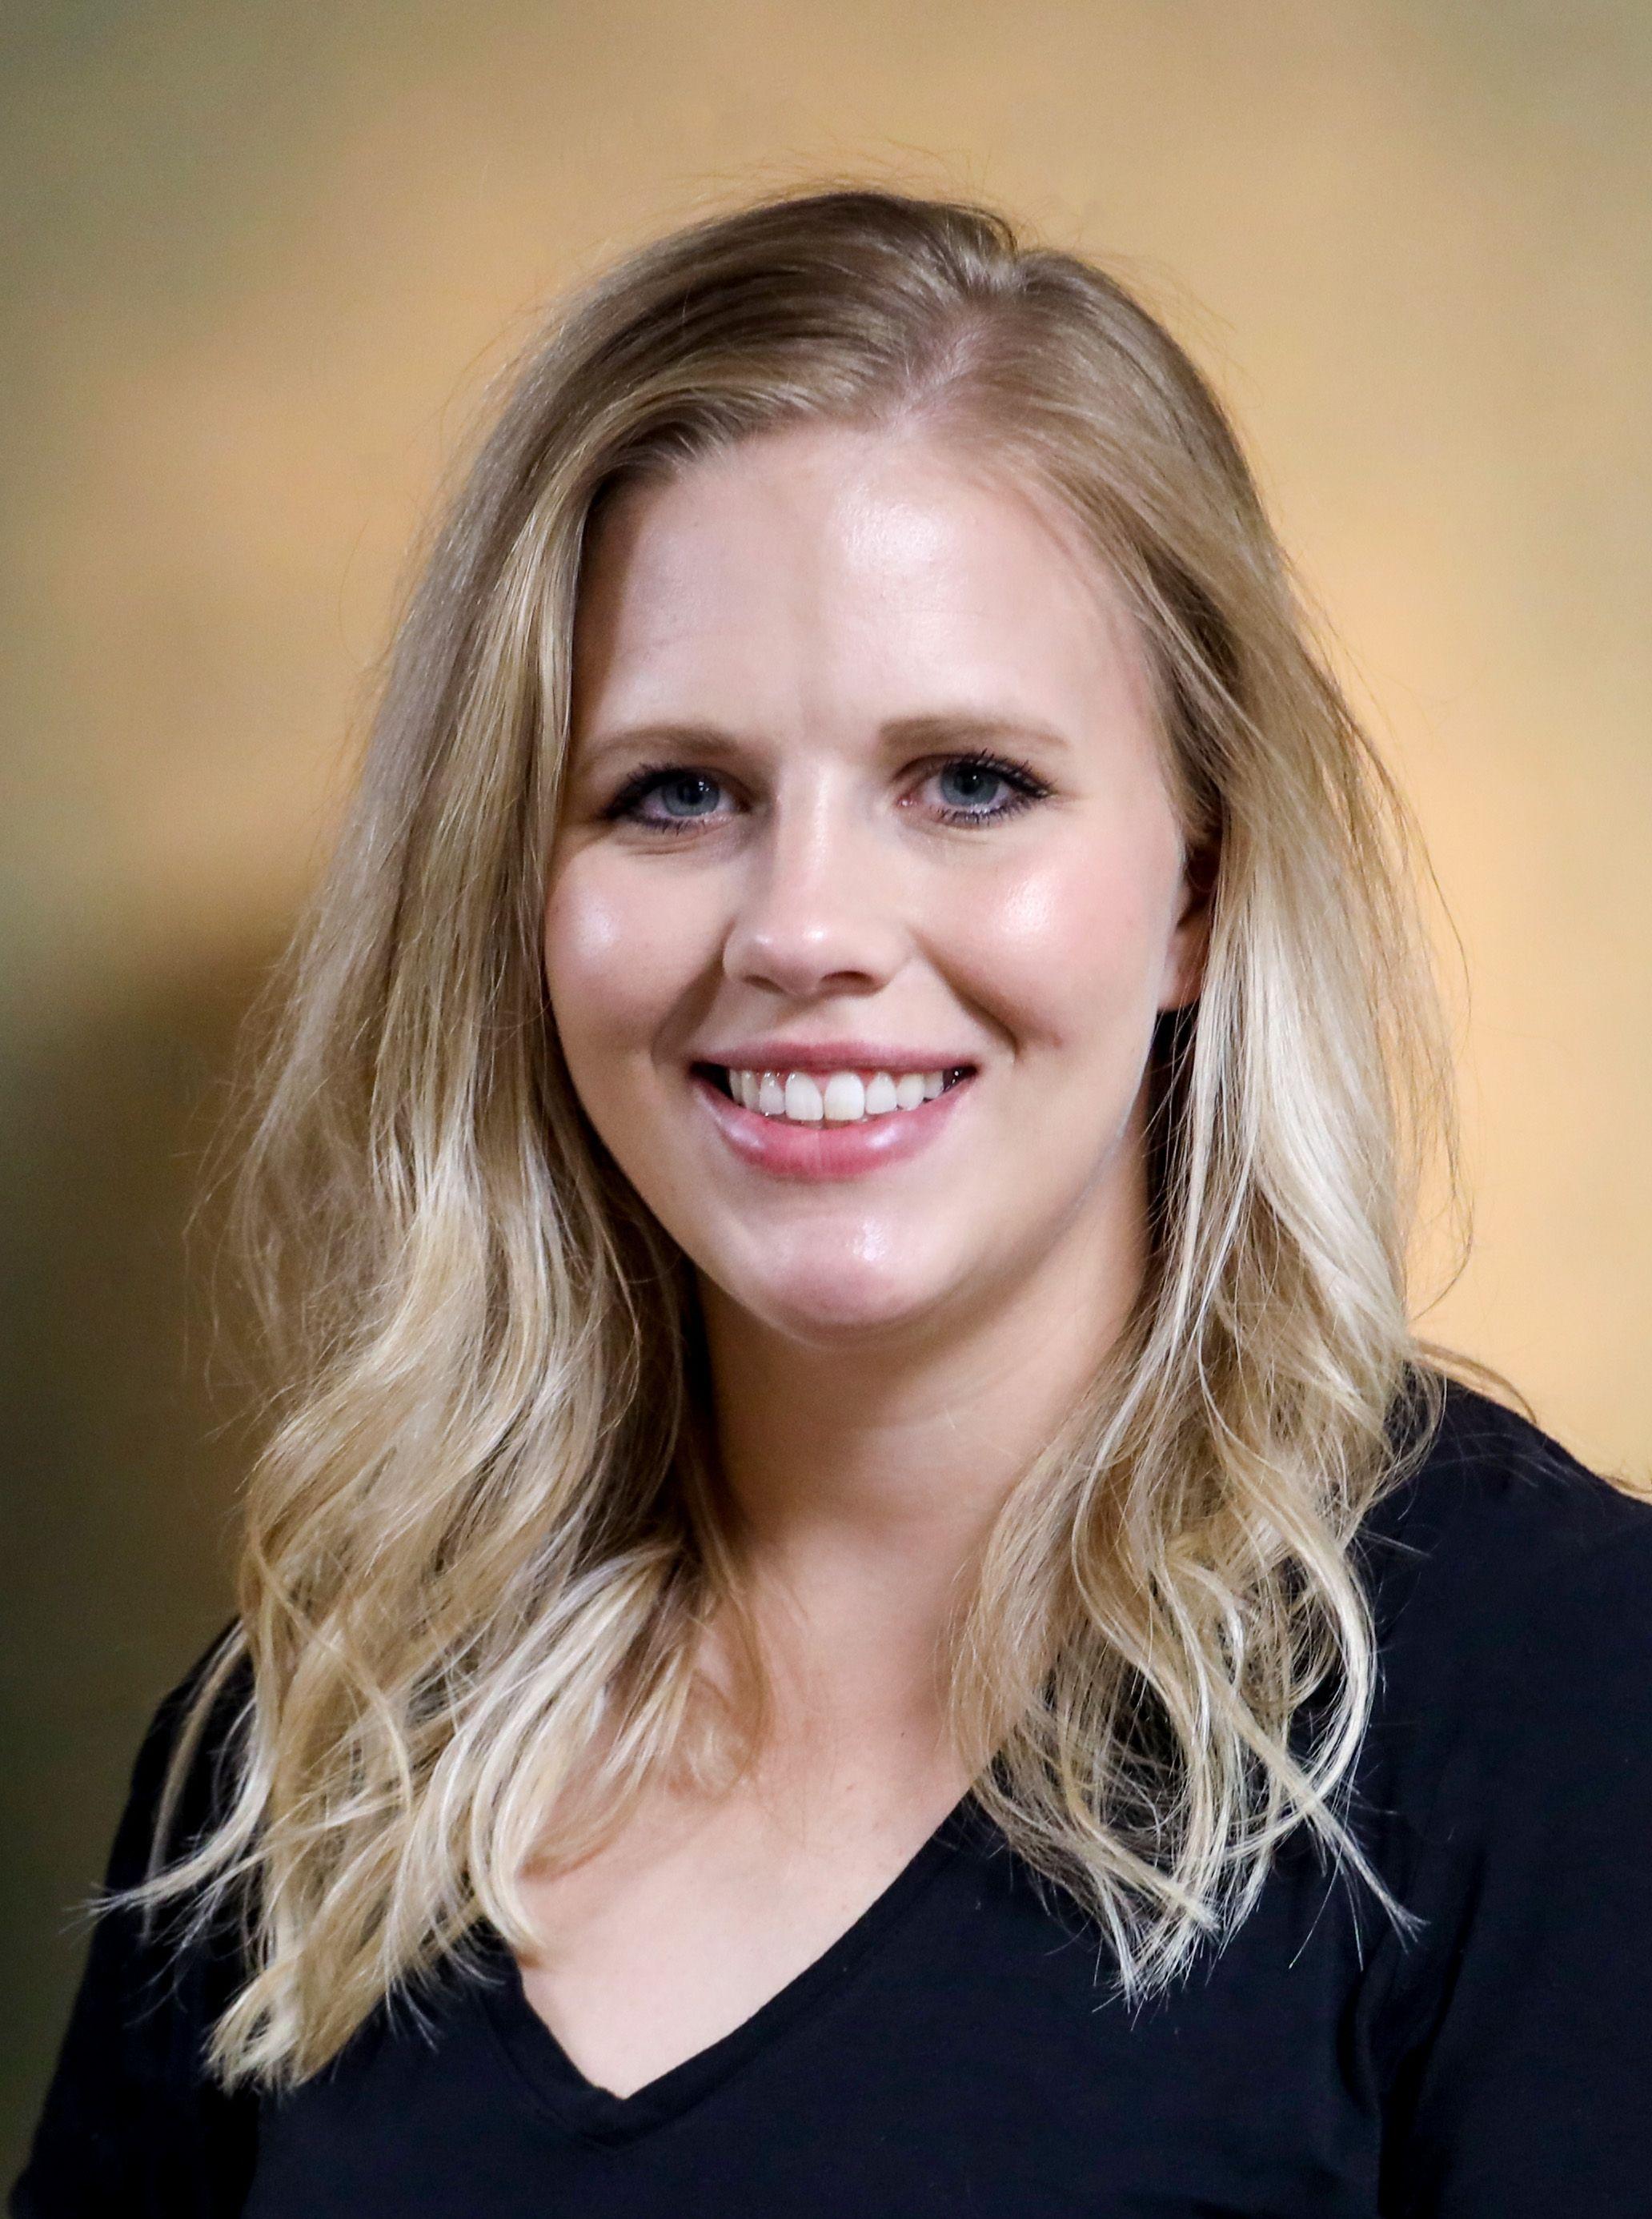 Year of the Nurse Feature: Veronica Golden, BSN, RN, CEN